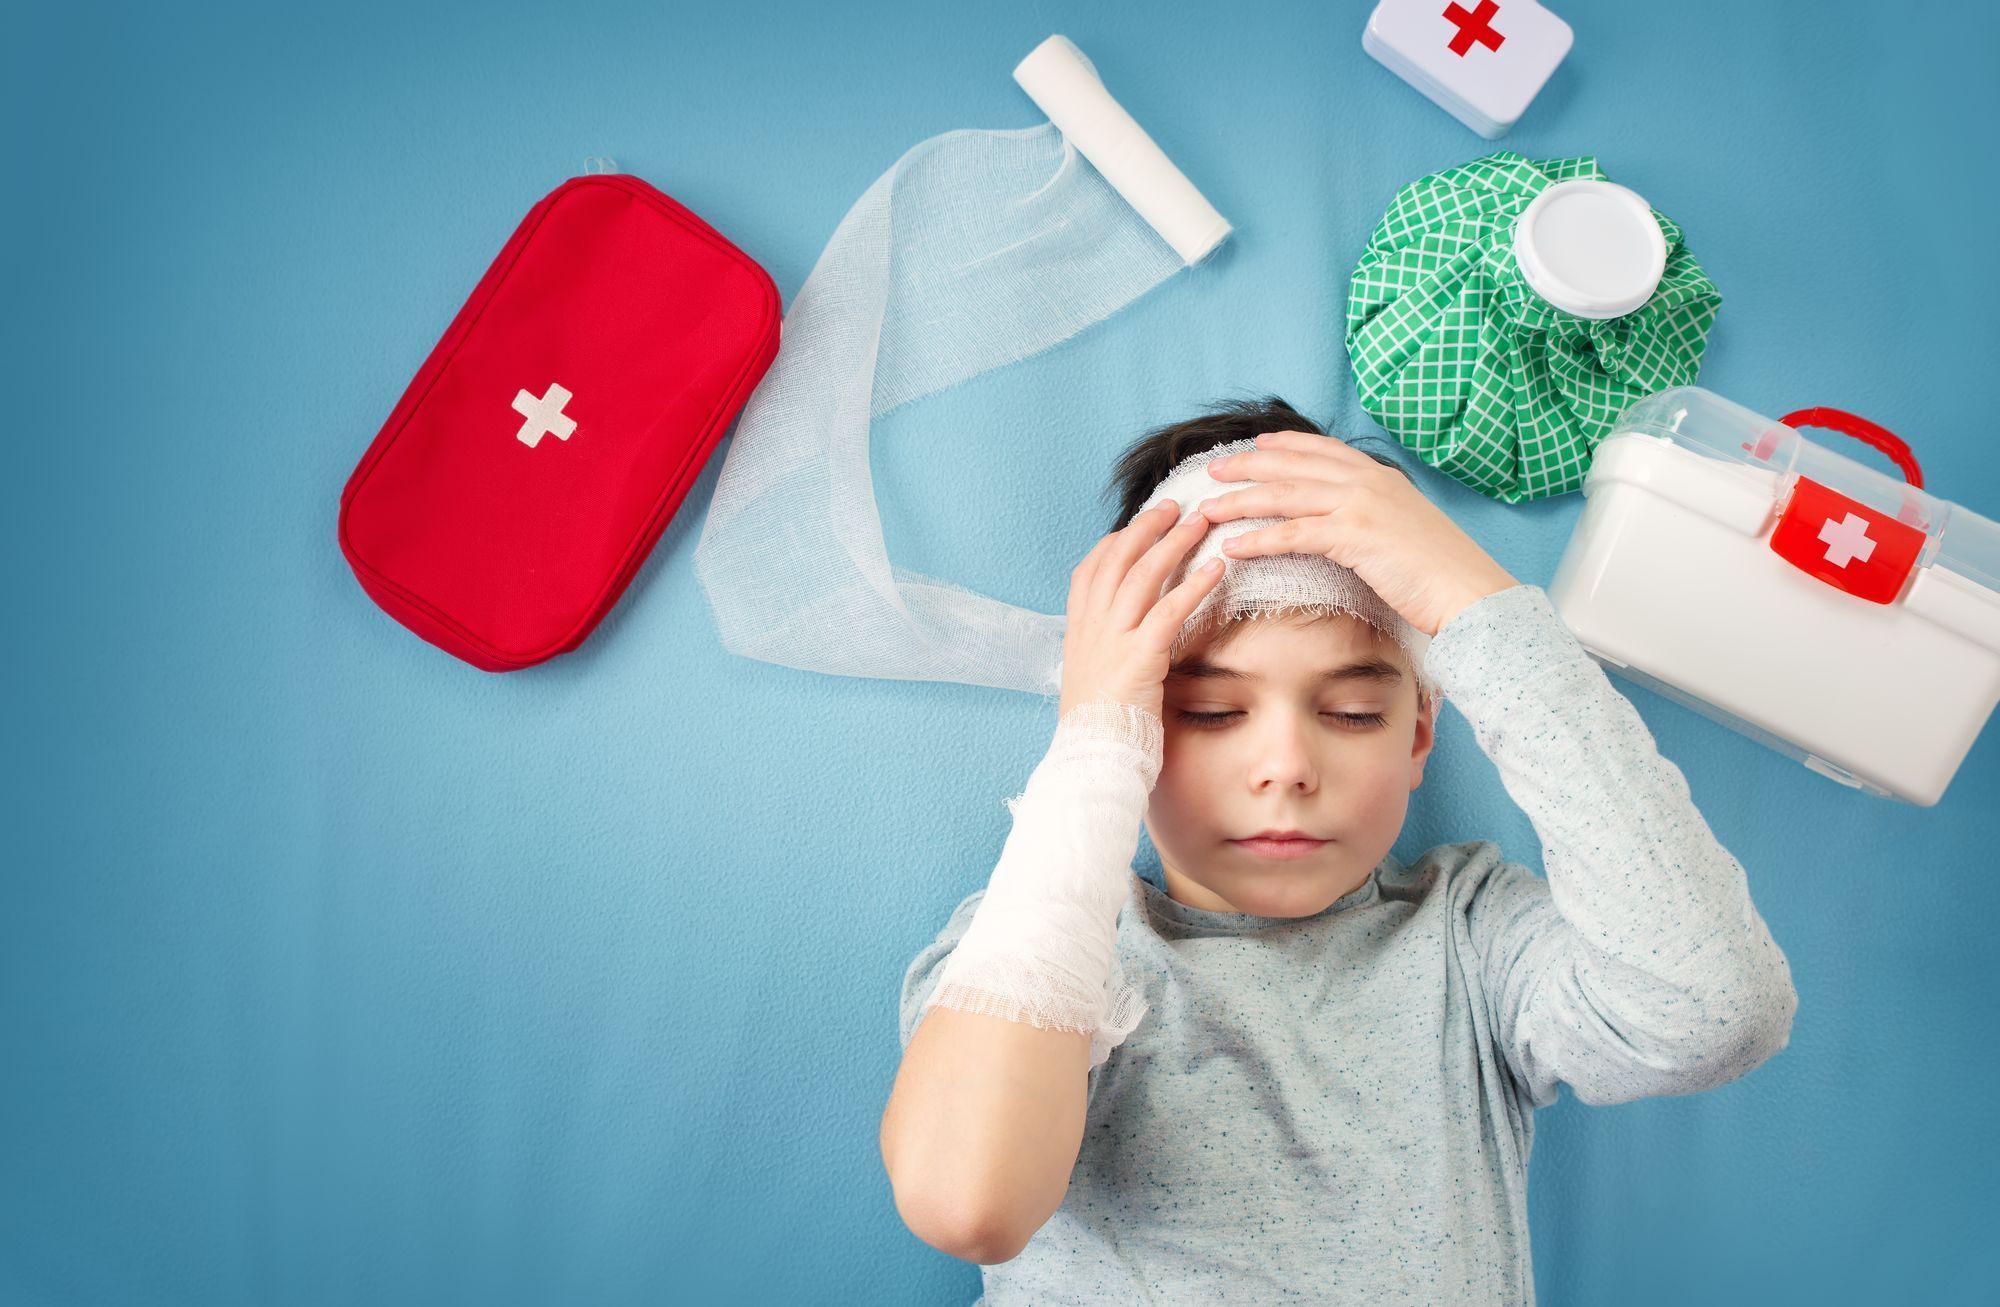 Traumatisme crânien enfant